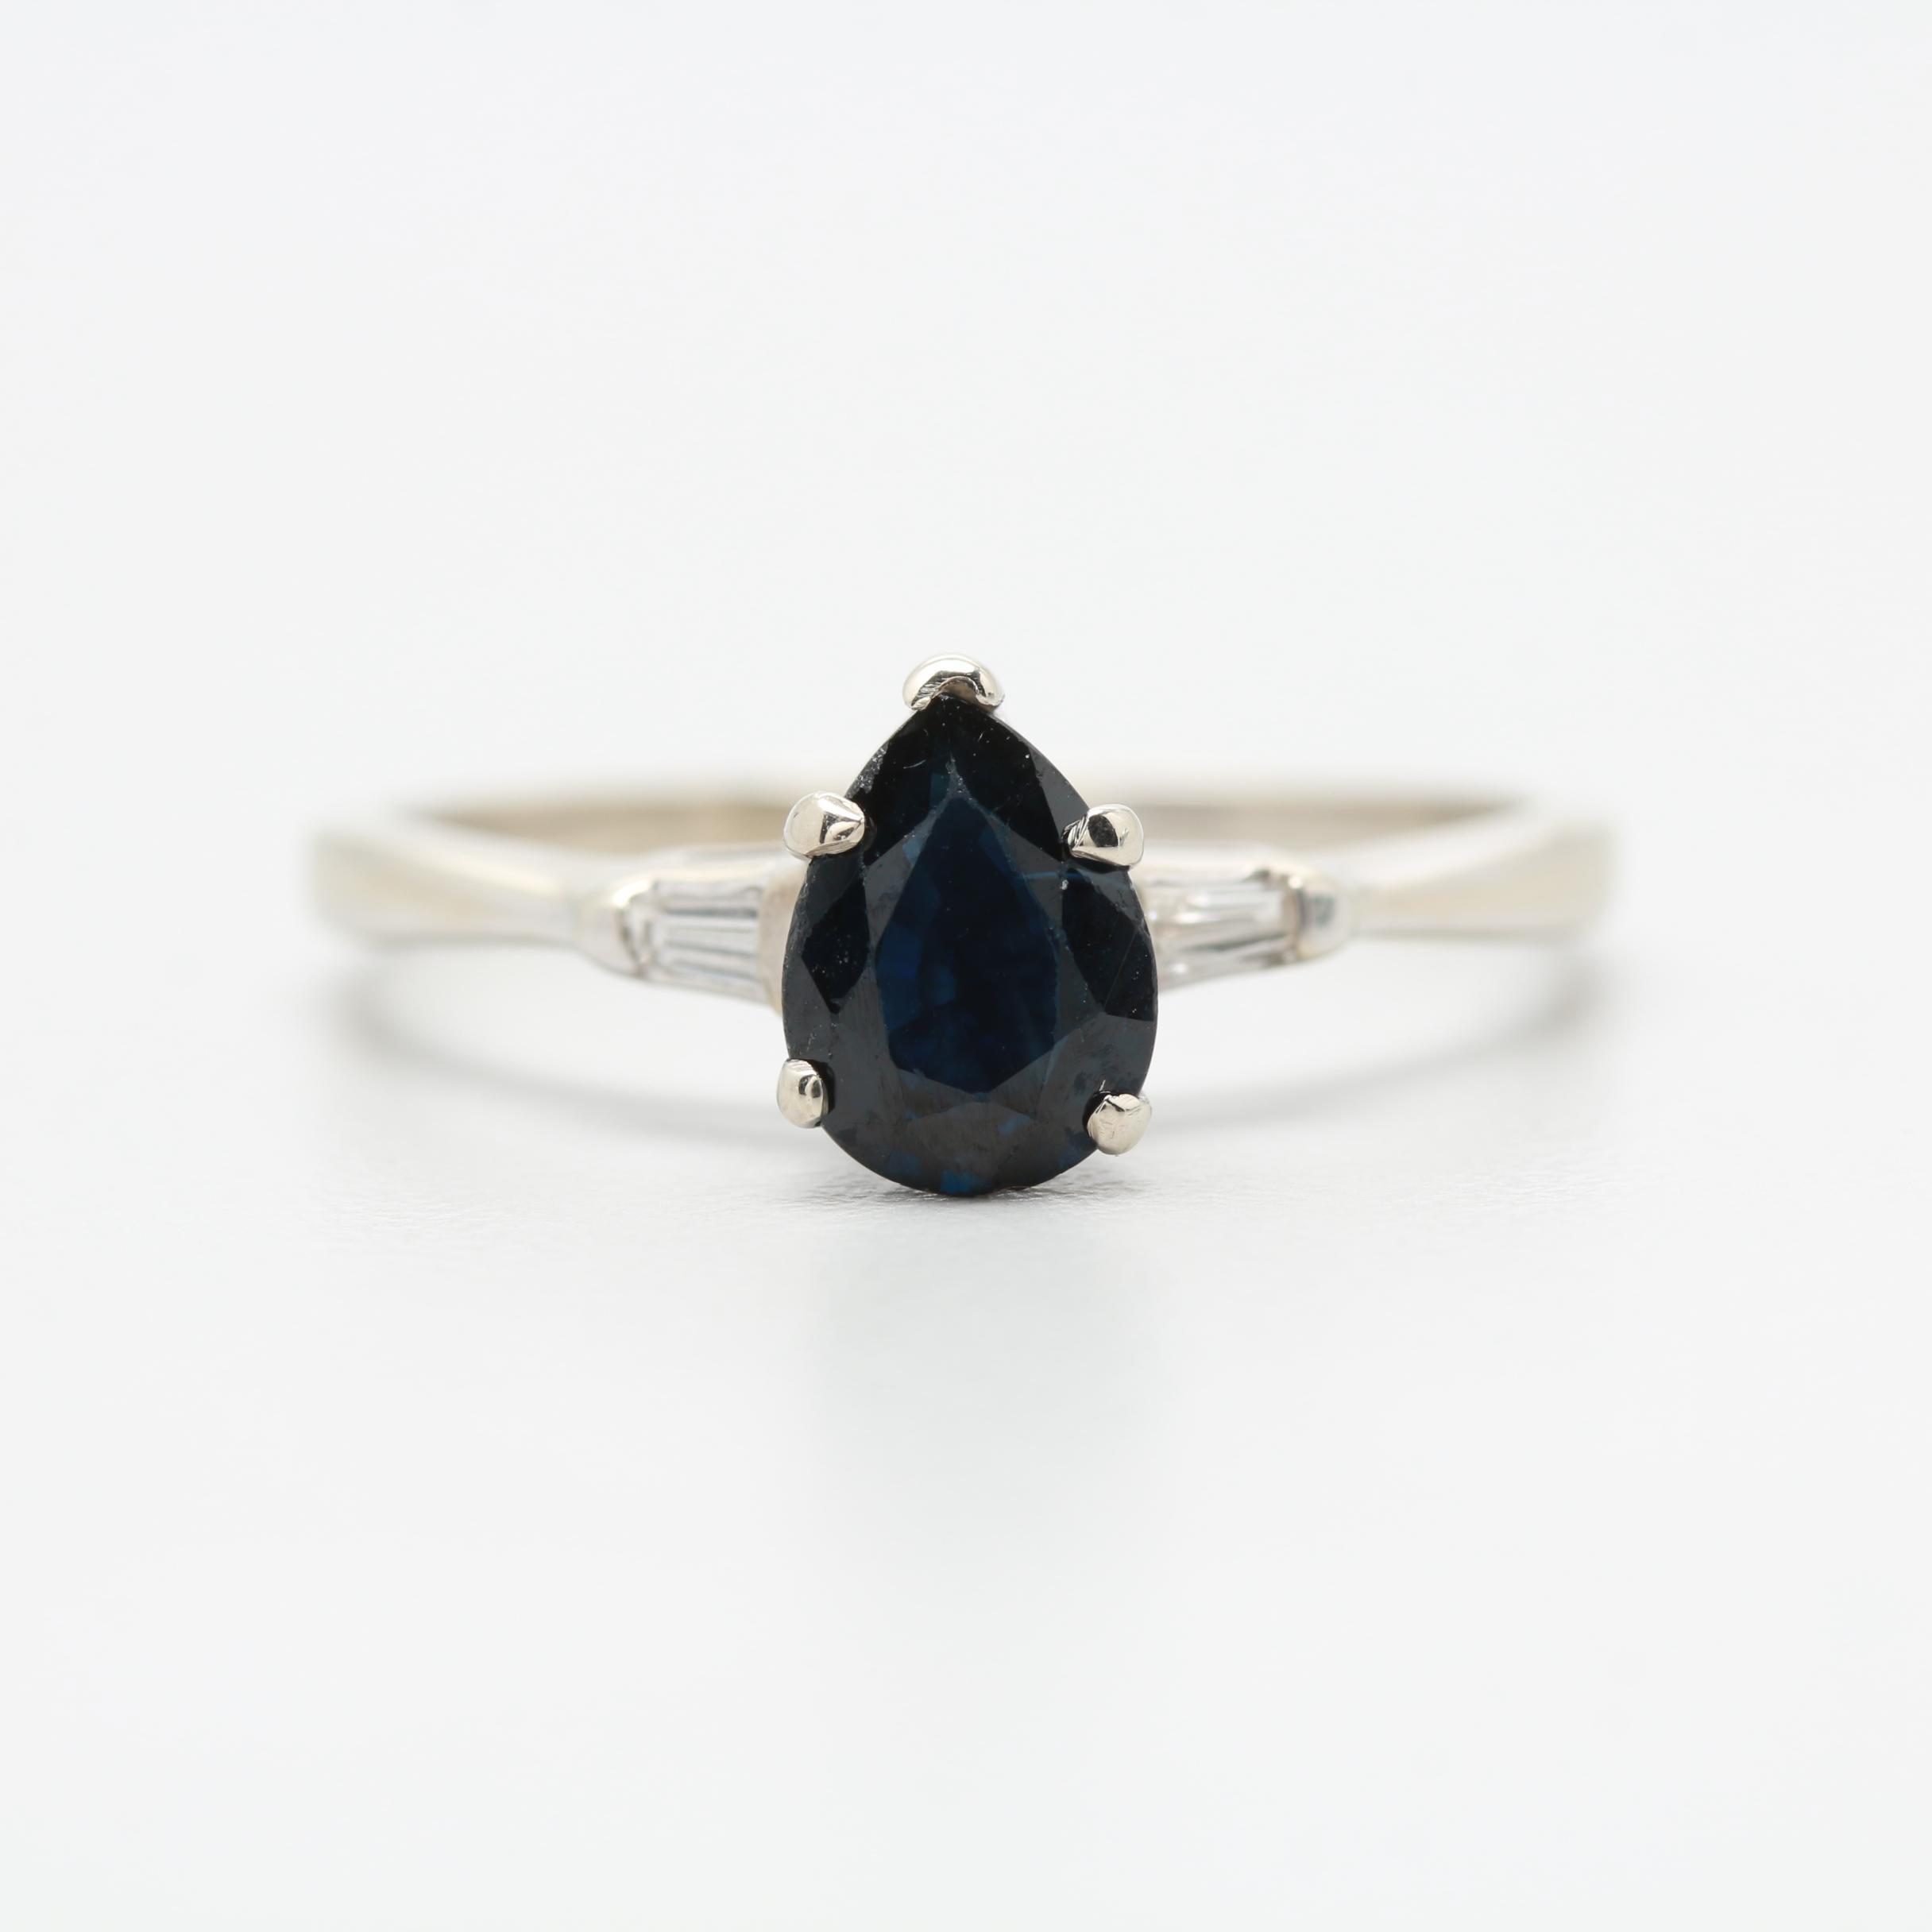 14K White Gold 1.17 CT Sapphire and Diamond Ring